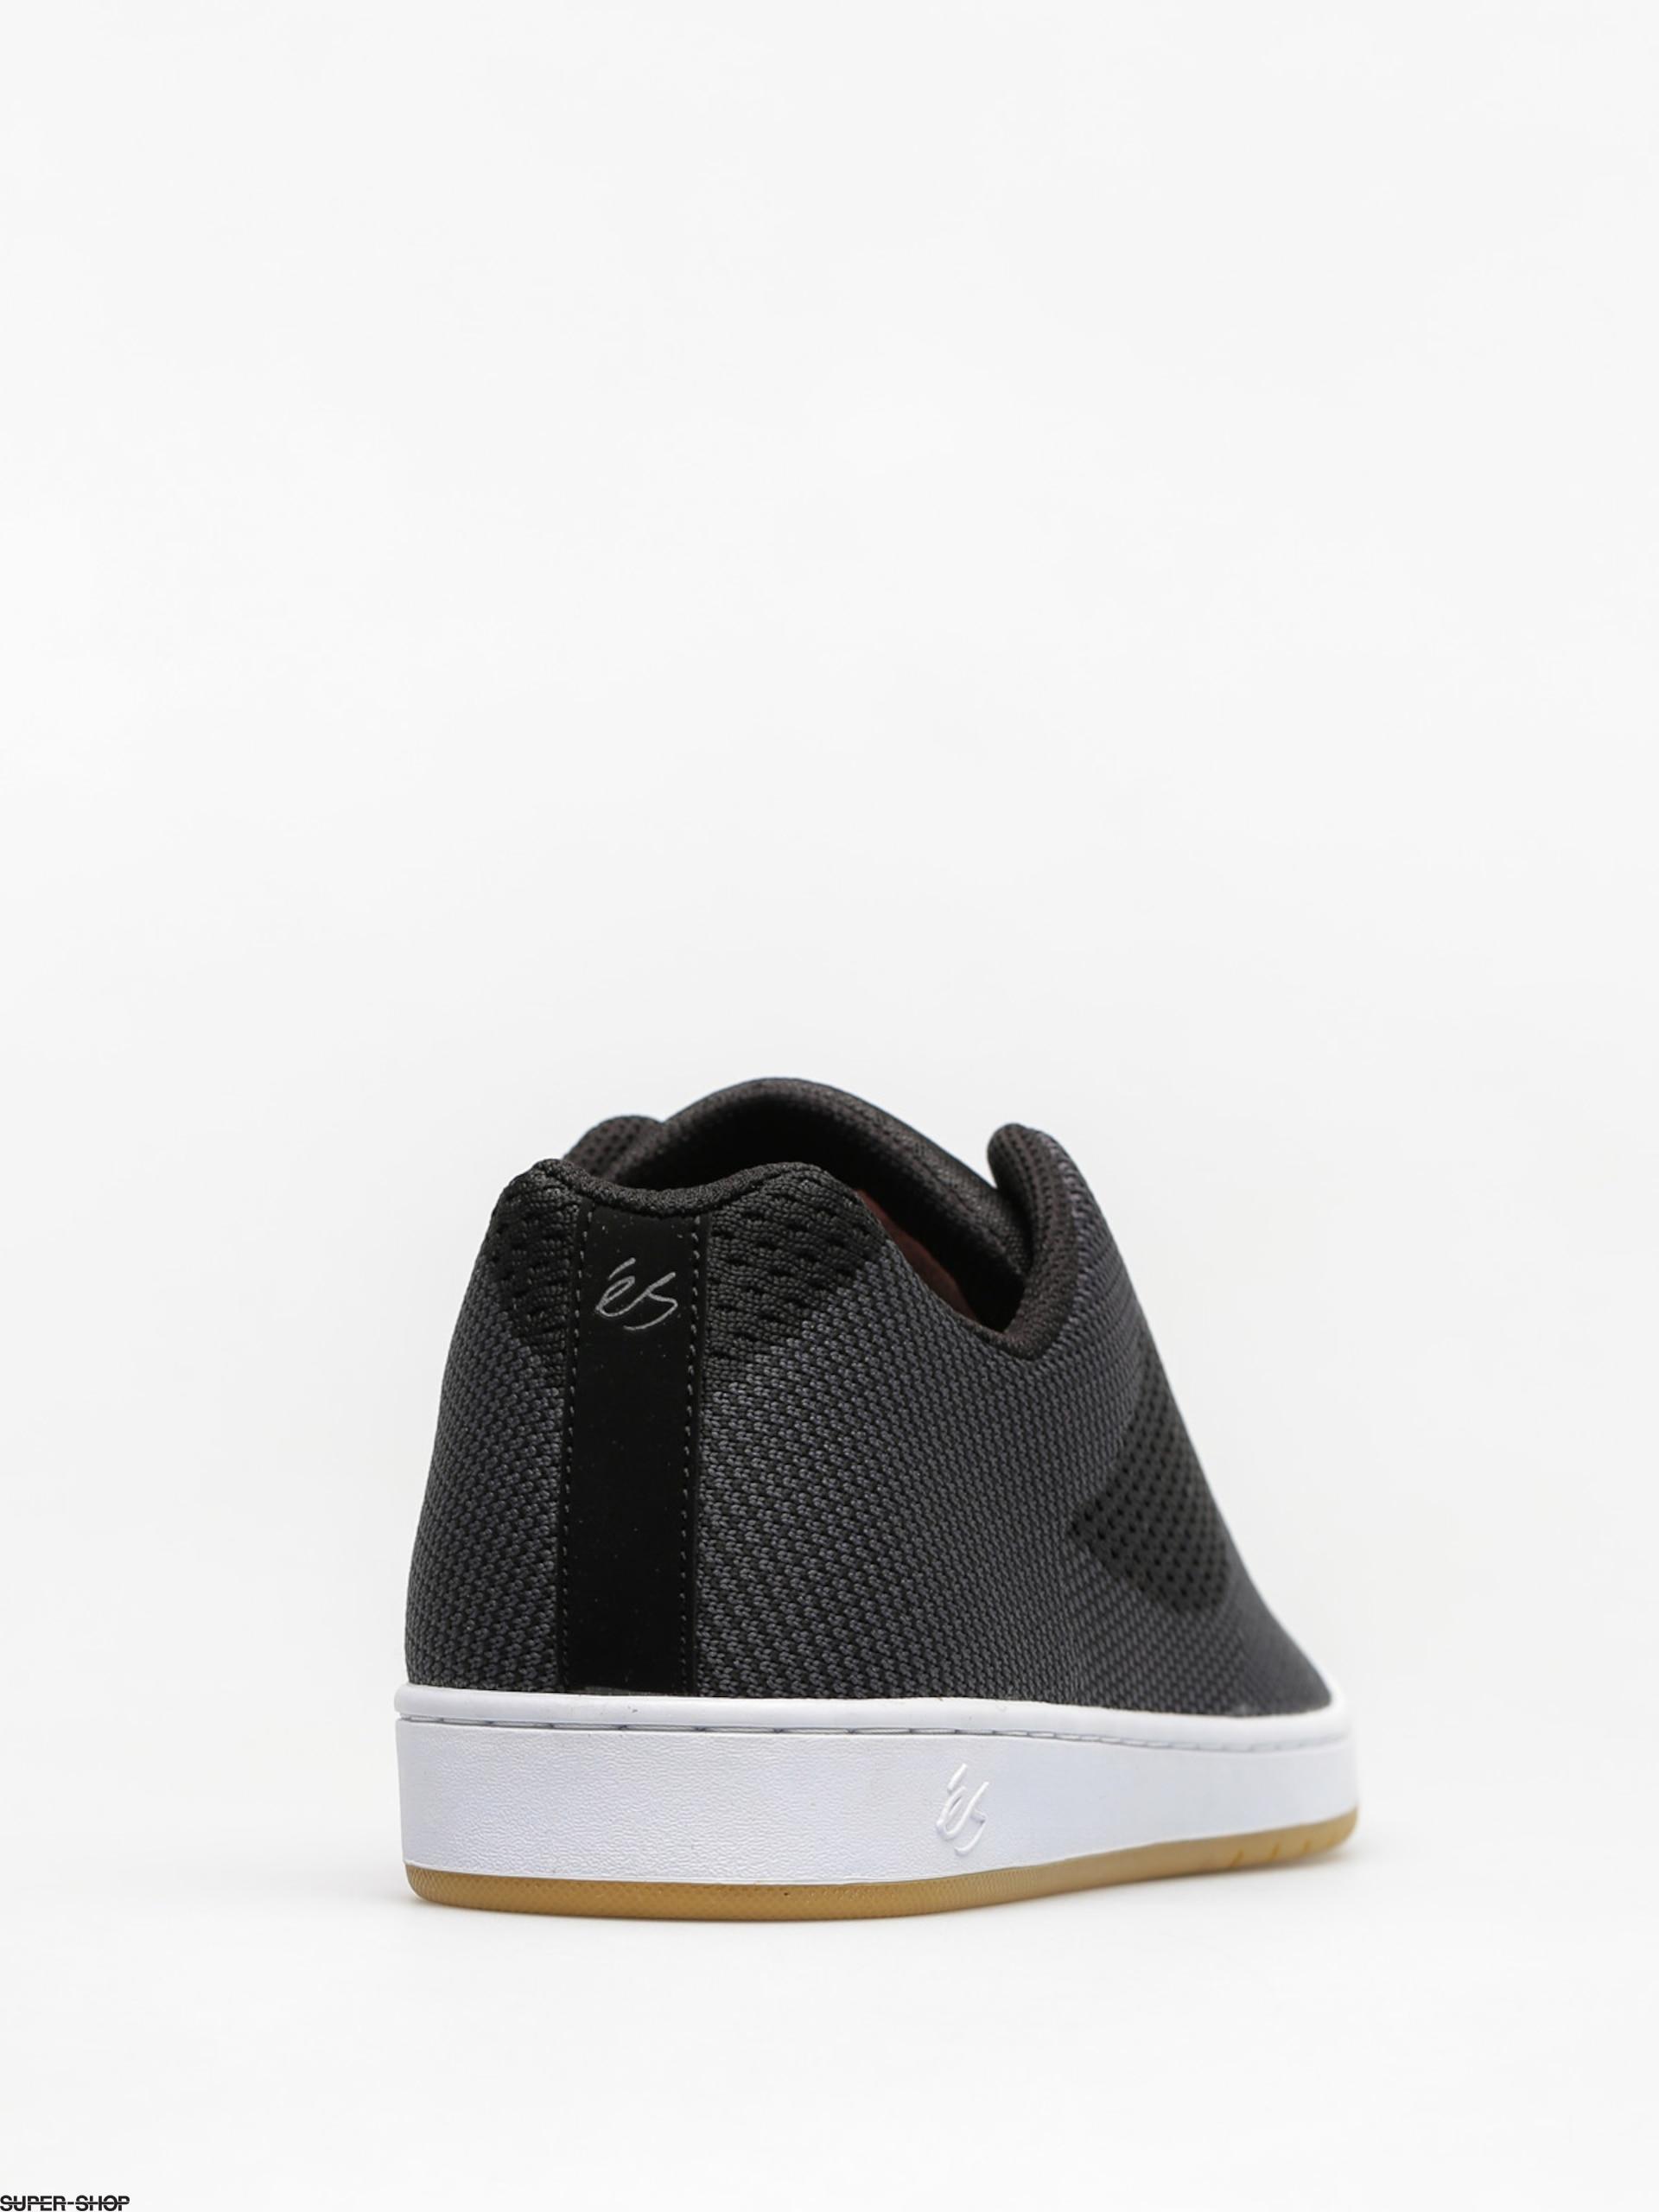 Es Accel Slim Ever Stitch Shoes Black